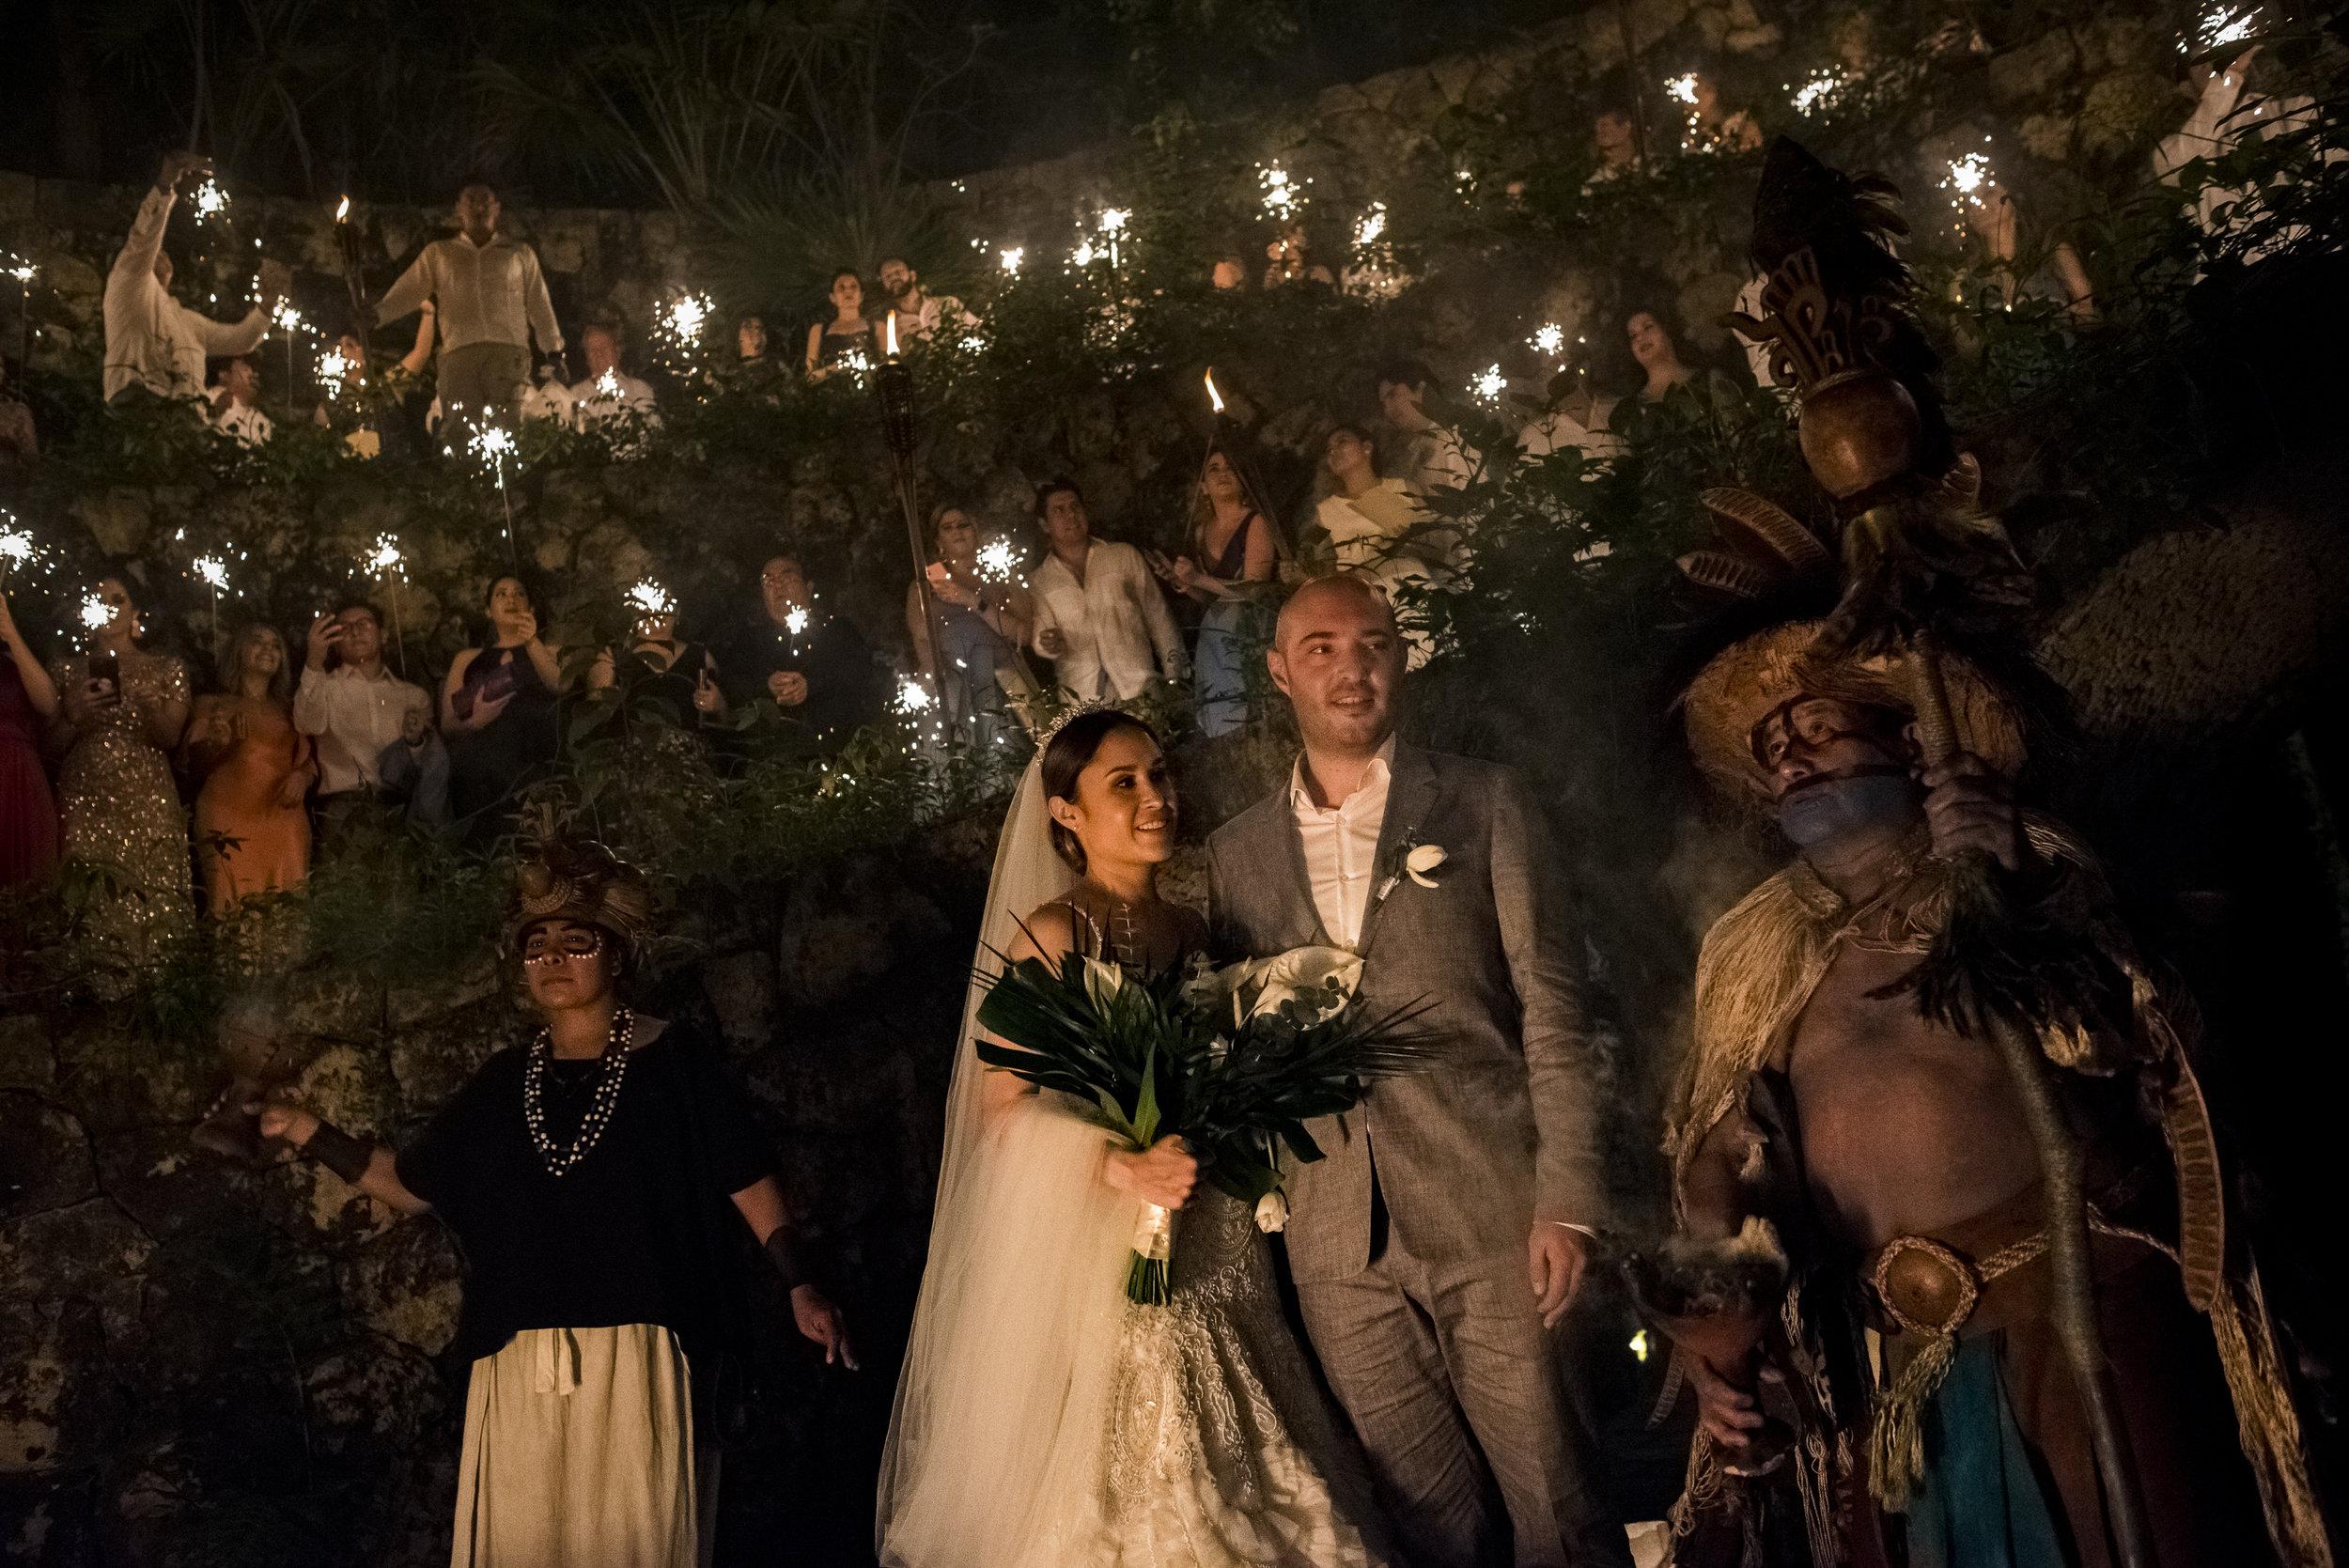 cancun_wedding_photographer_mexico (73).jpg